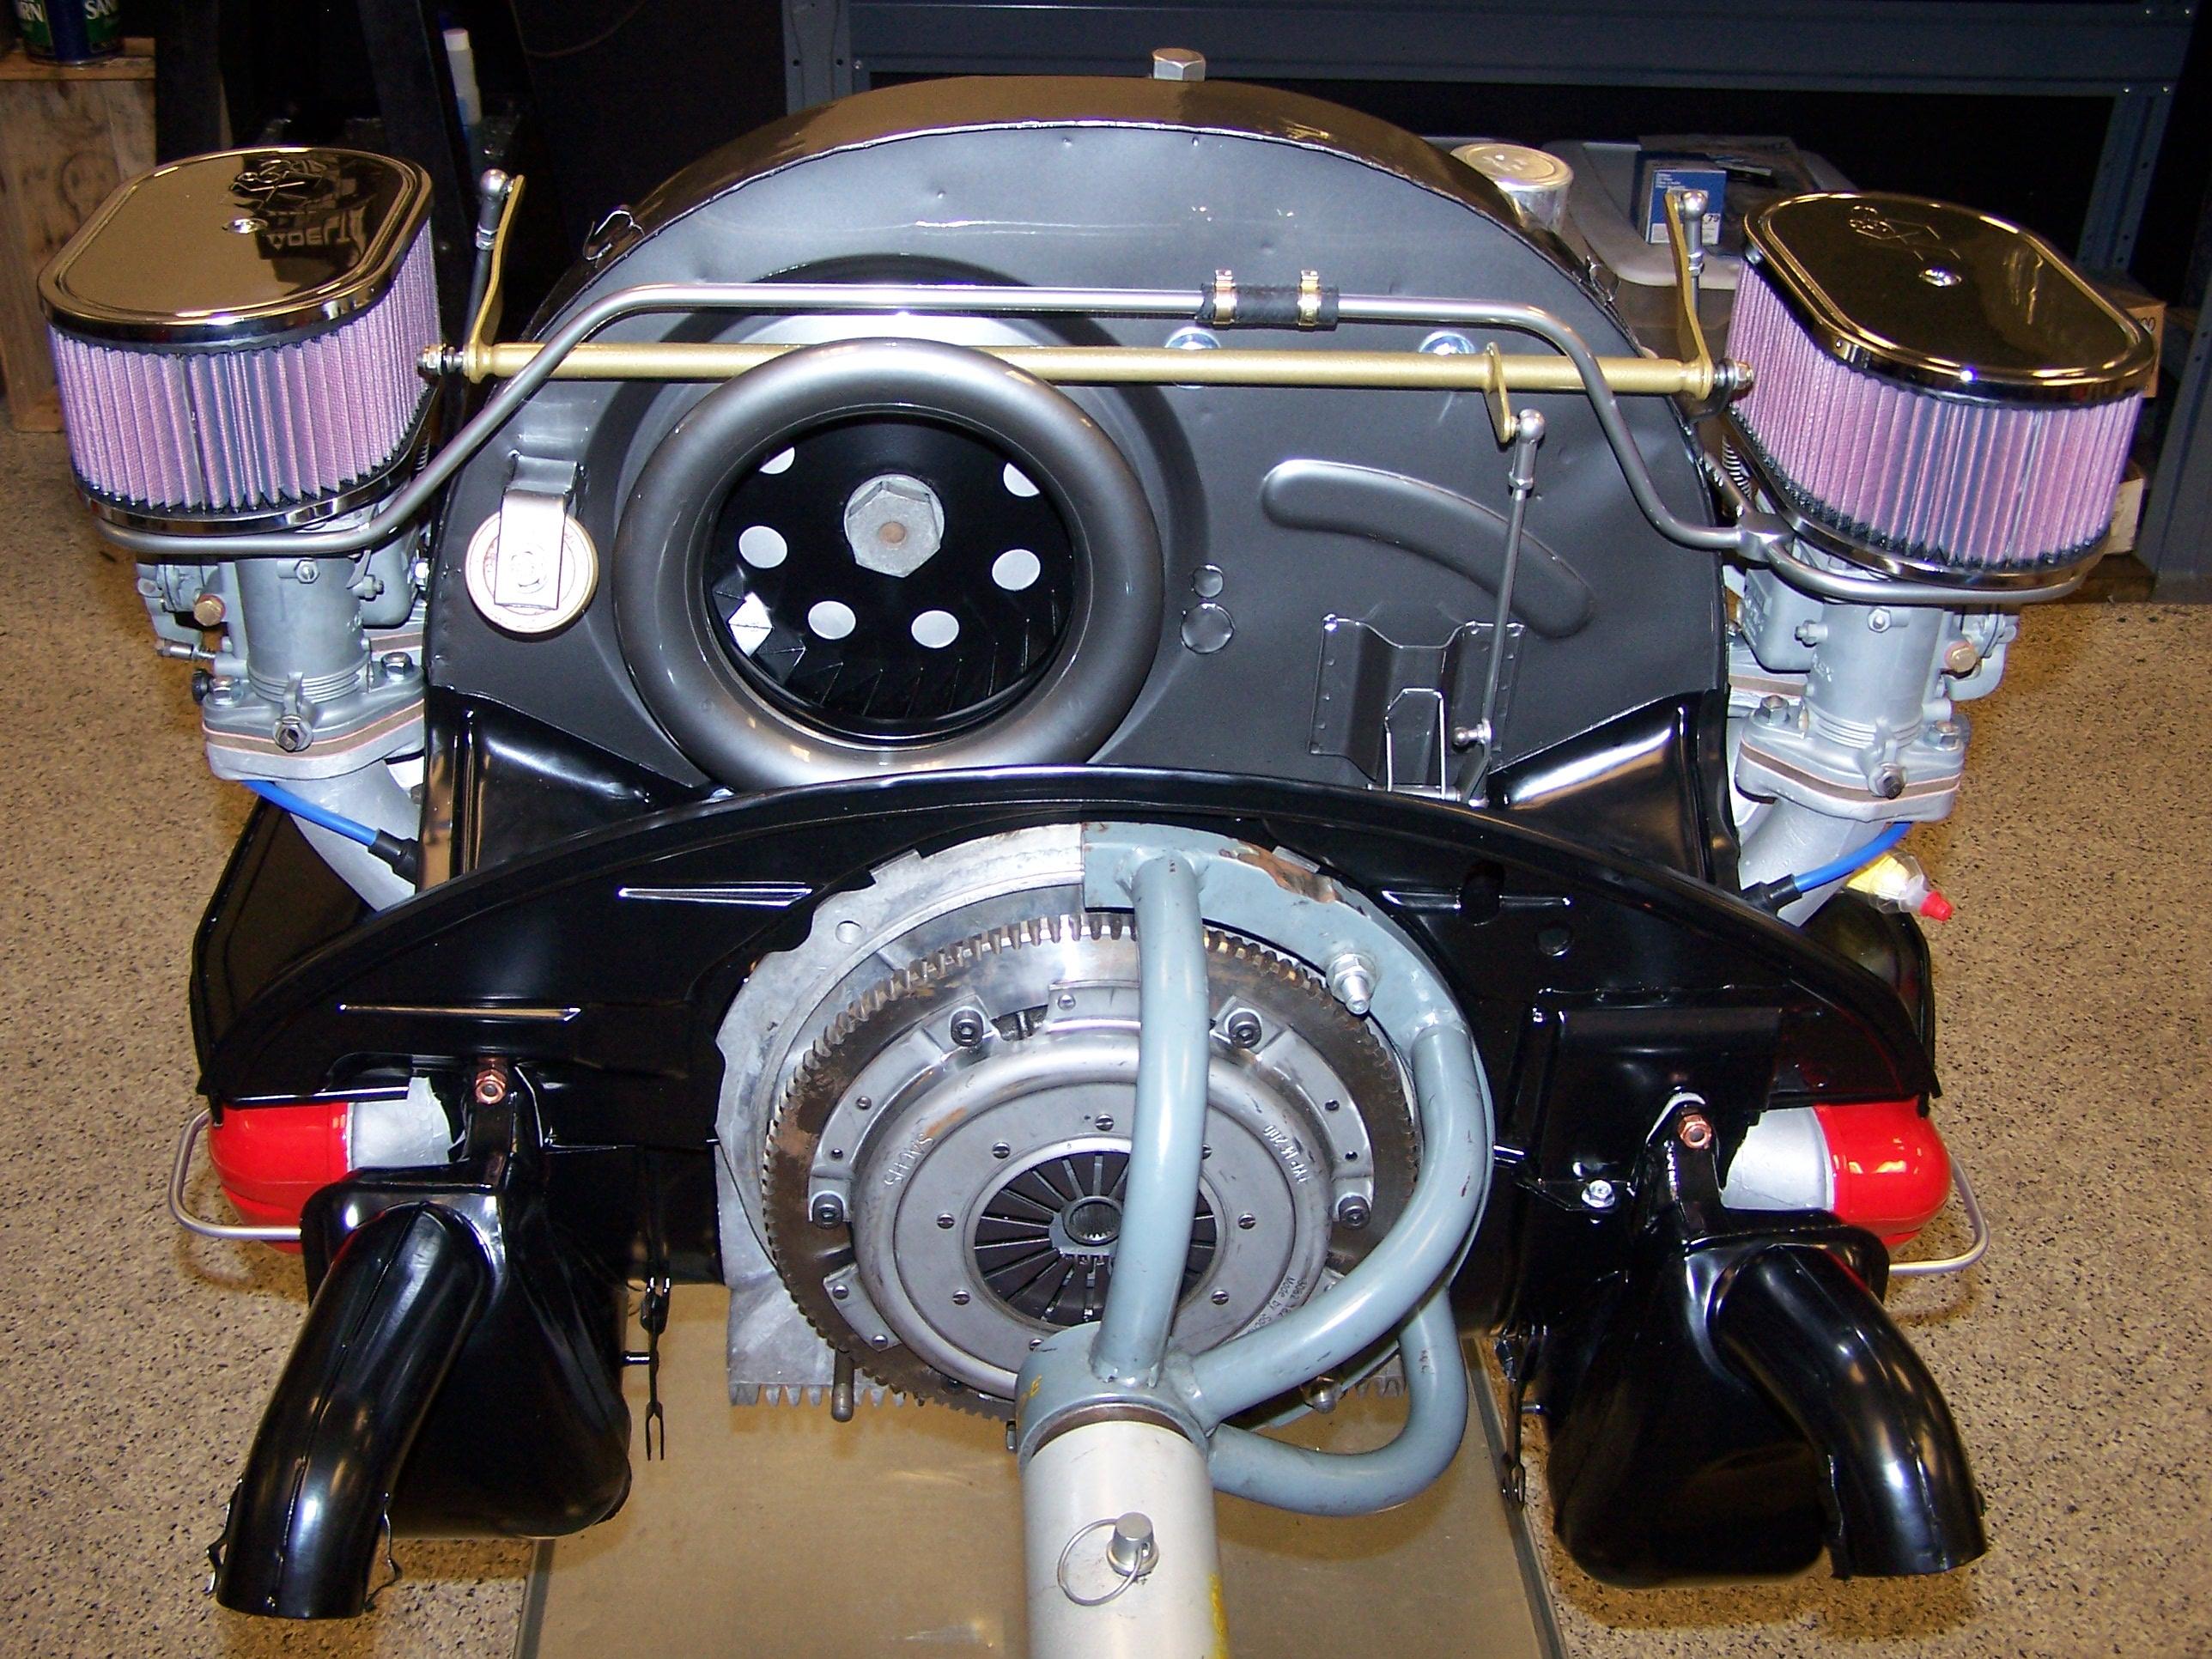 1963 Porsche 356 Super 90 Engine Rebuild Completed